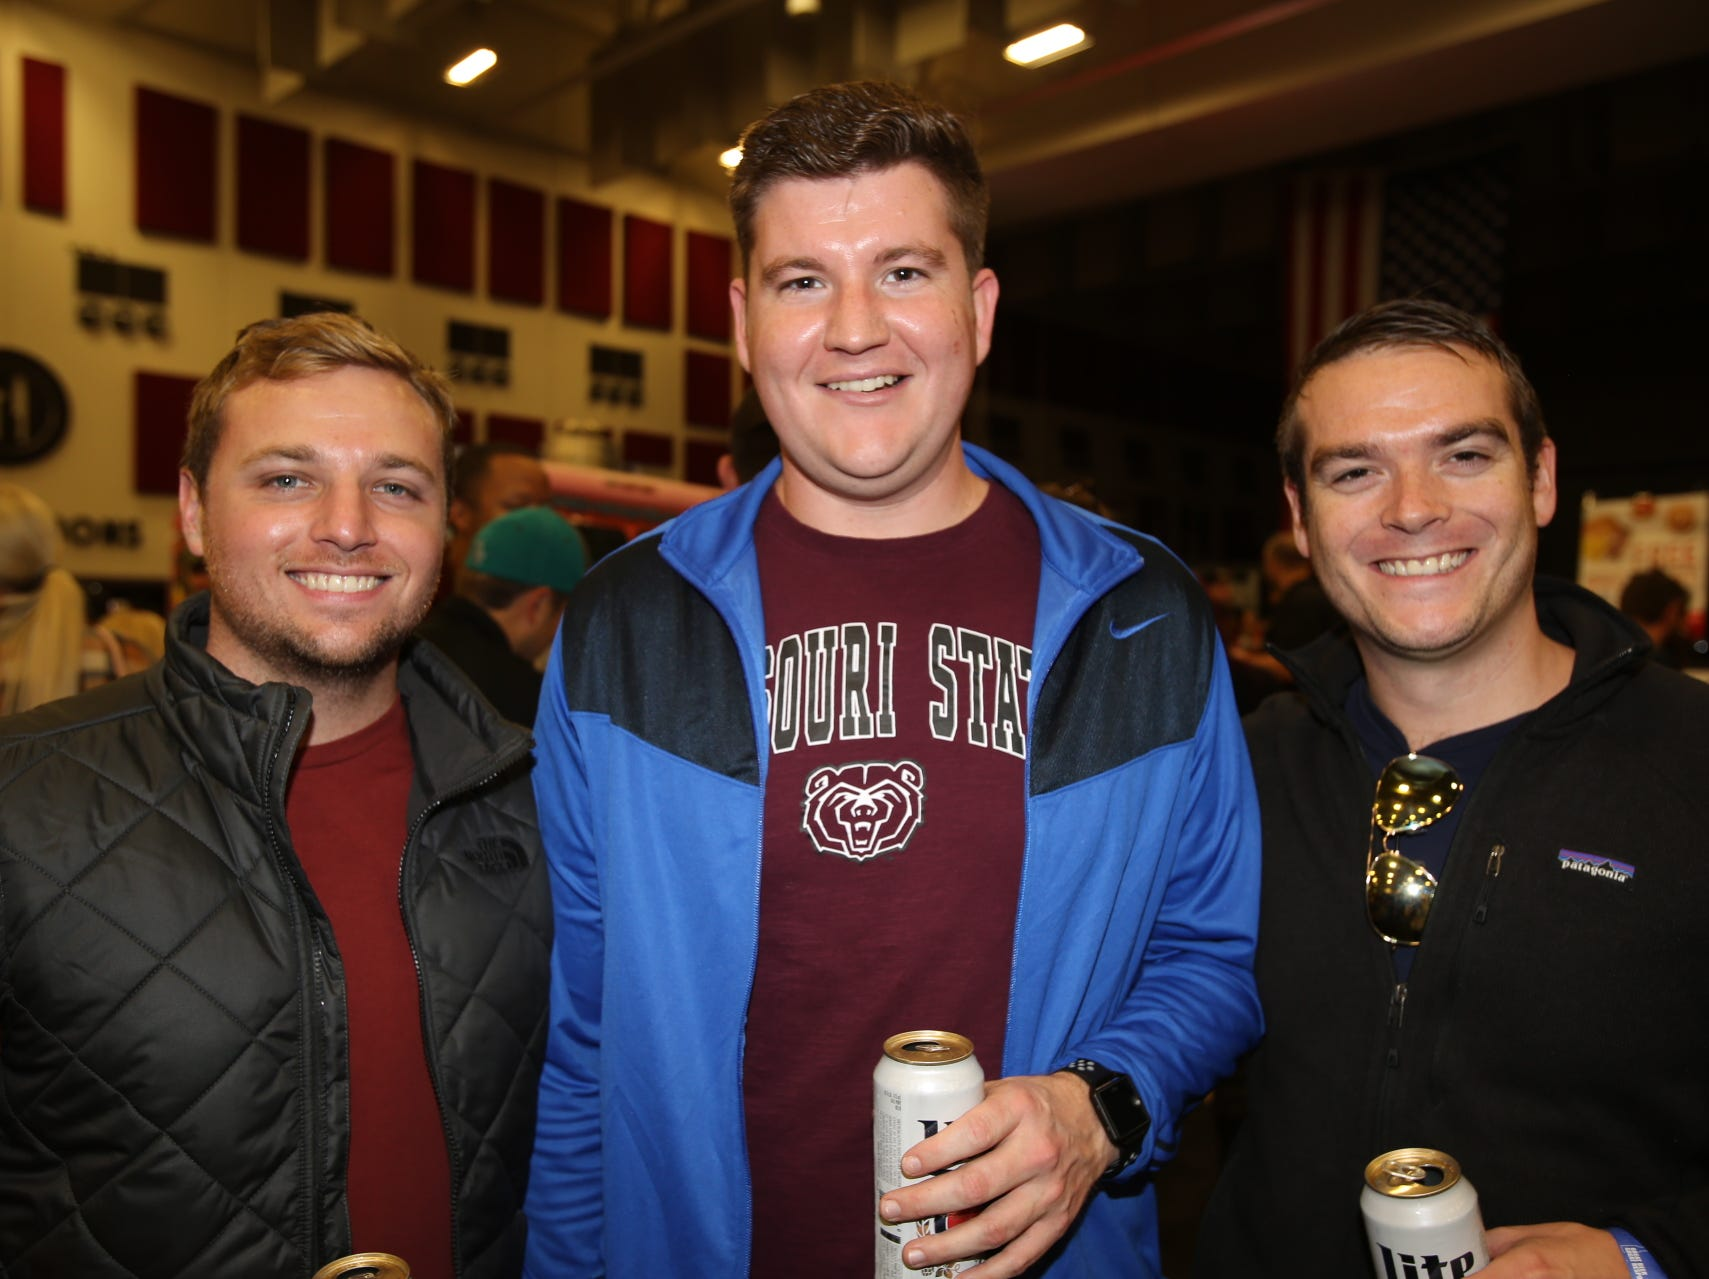 Kyle Borneman, Eric Schmidt, and Justin Hall